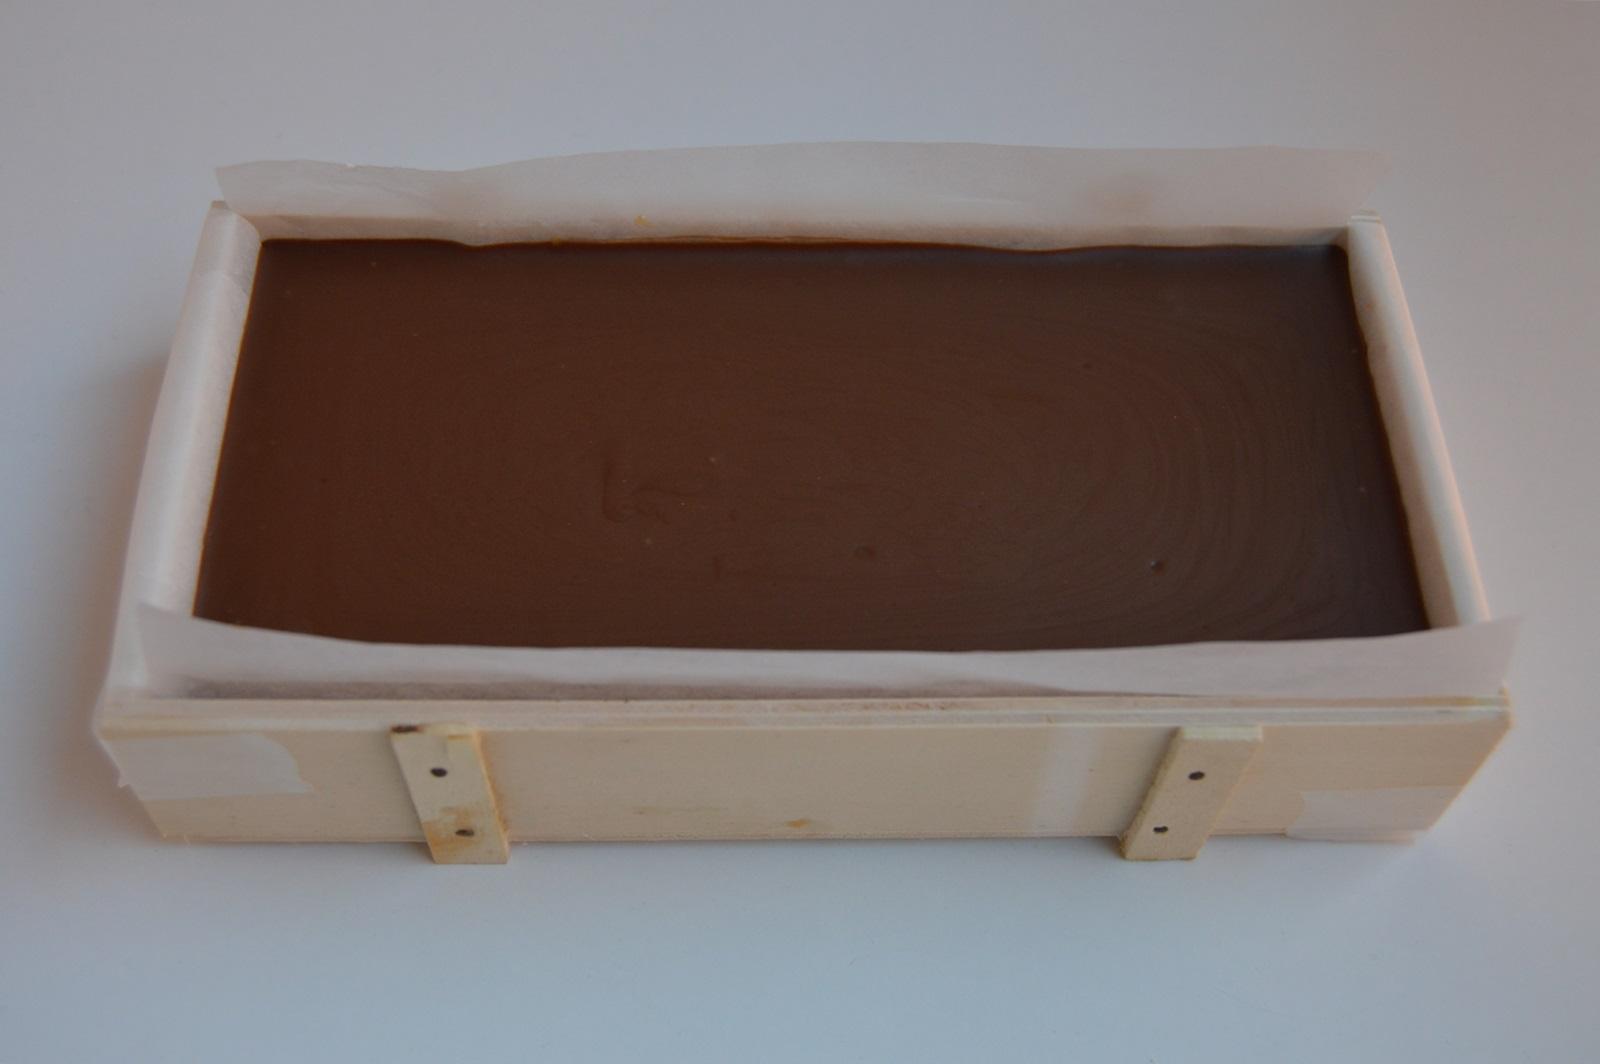 Tercera capa del turrón. Aroma de chocolate